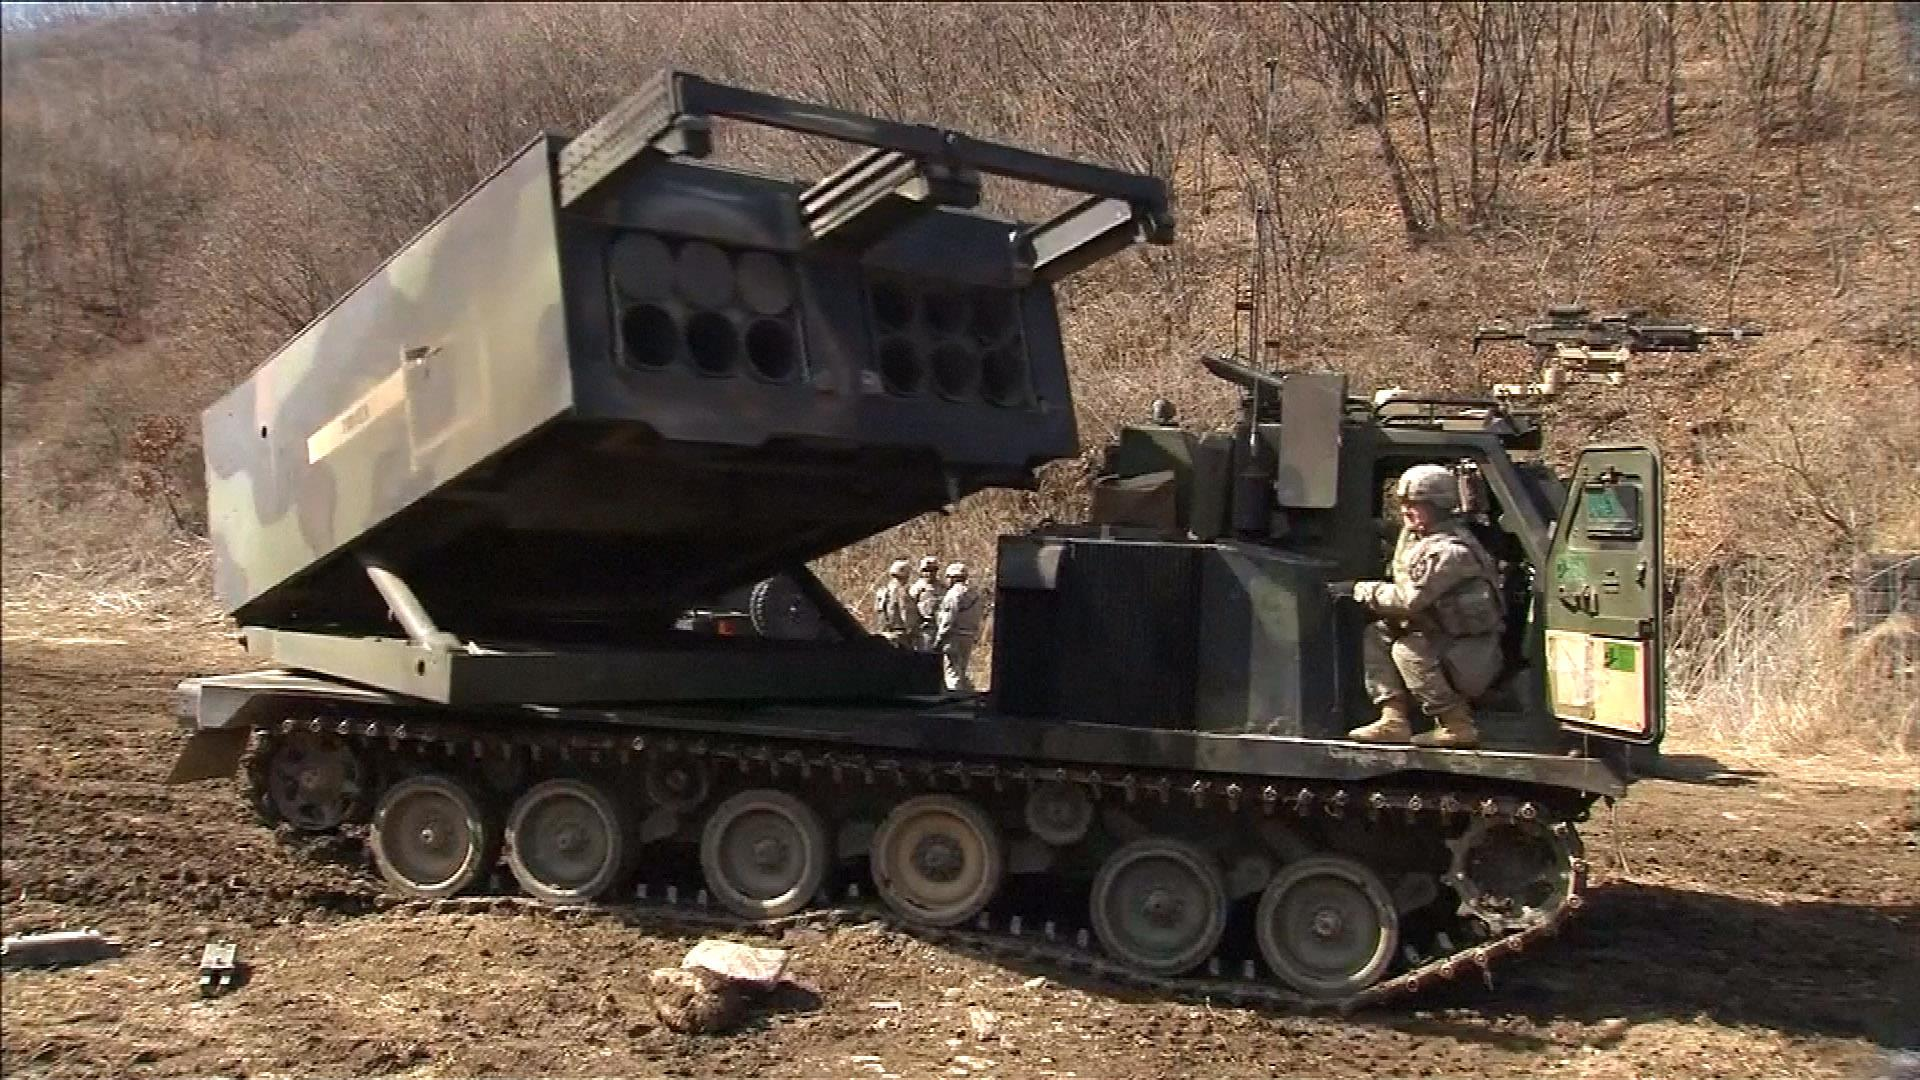 North Korea: U.S. Military Drills Take Region to 'Brink of War'